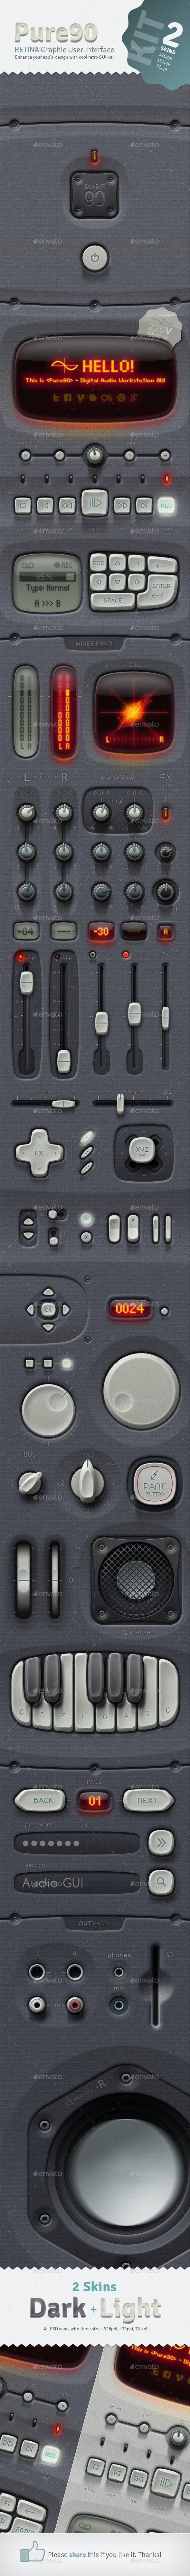 Pure90 - Retina Digital Audio Workstation GUI Kit - User Interfaces Web Elements